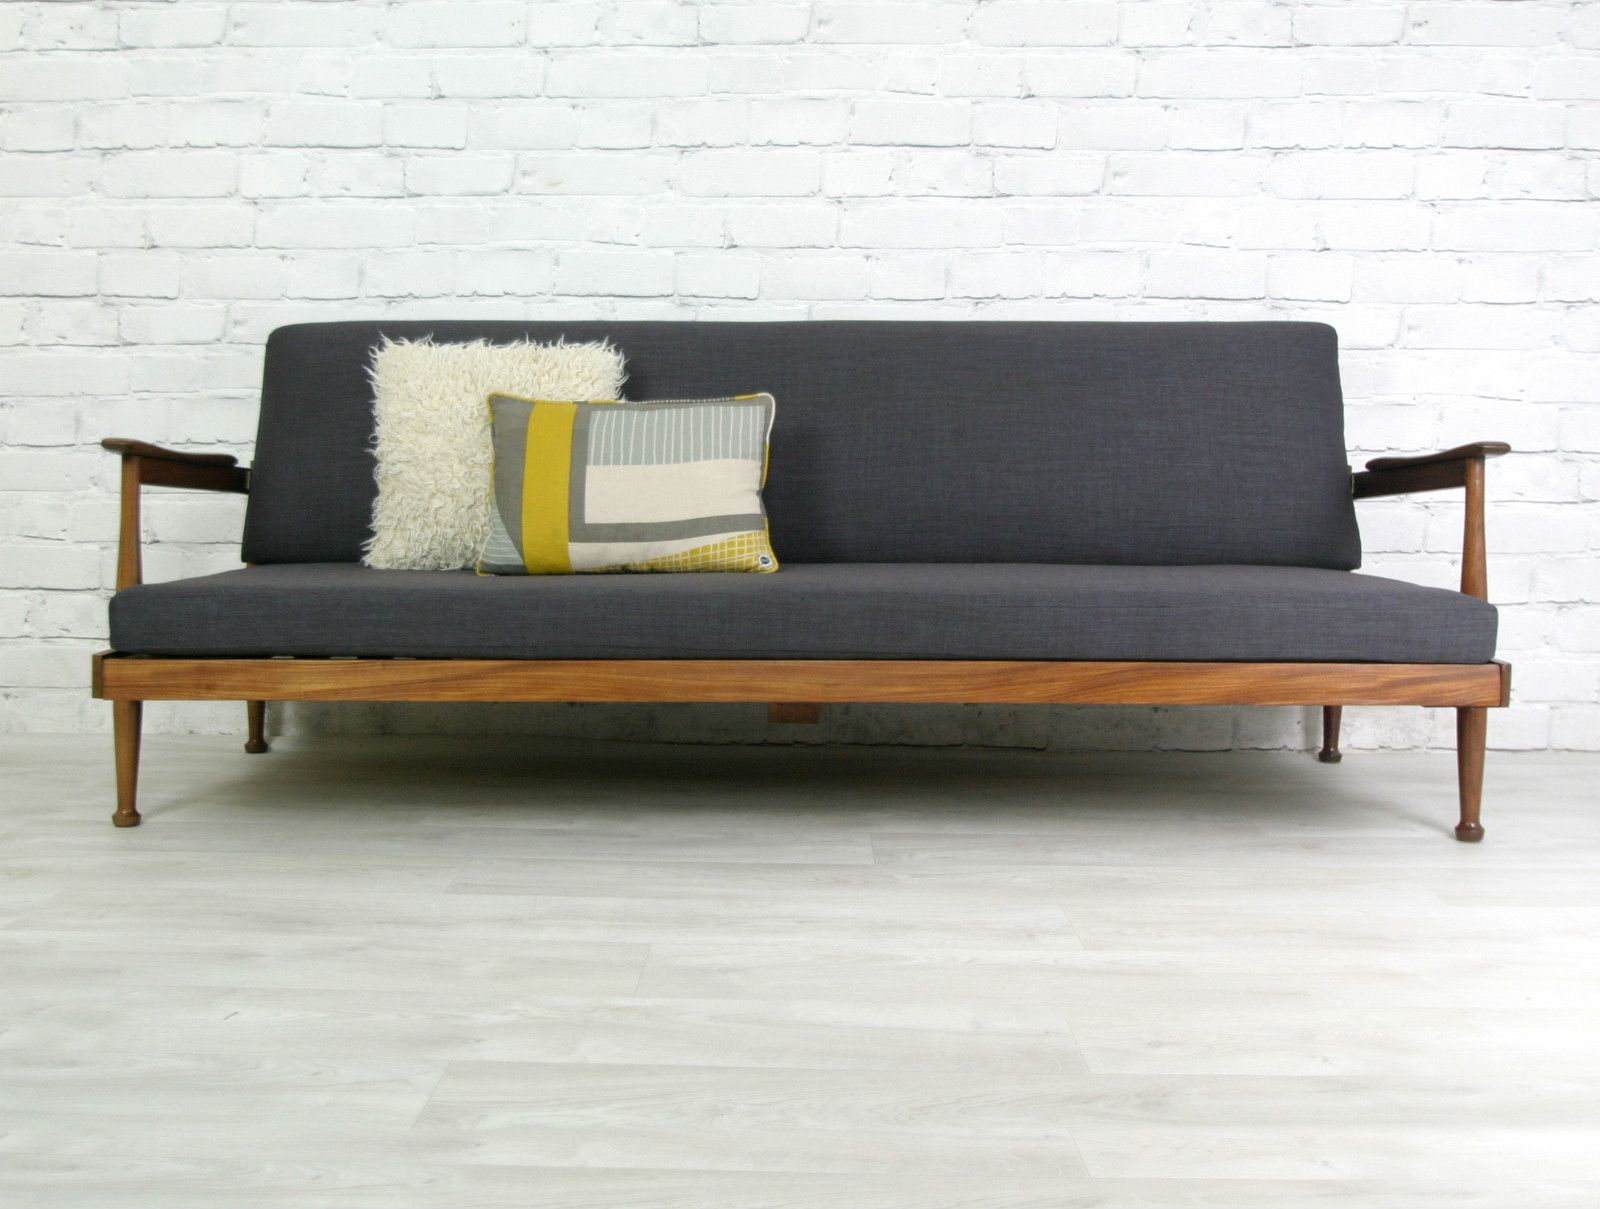 Guy Rogers Retro Vintage Teak Mid Century Danish Style Sofa Bed